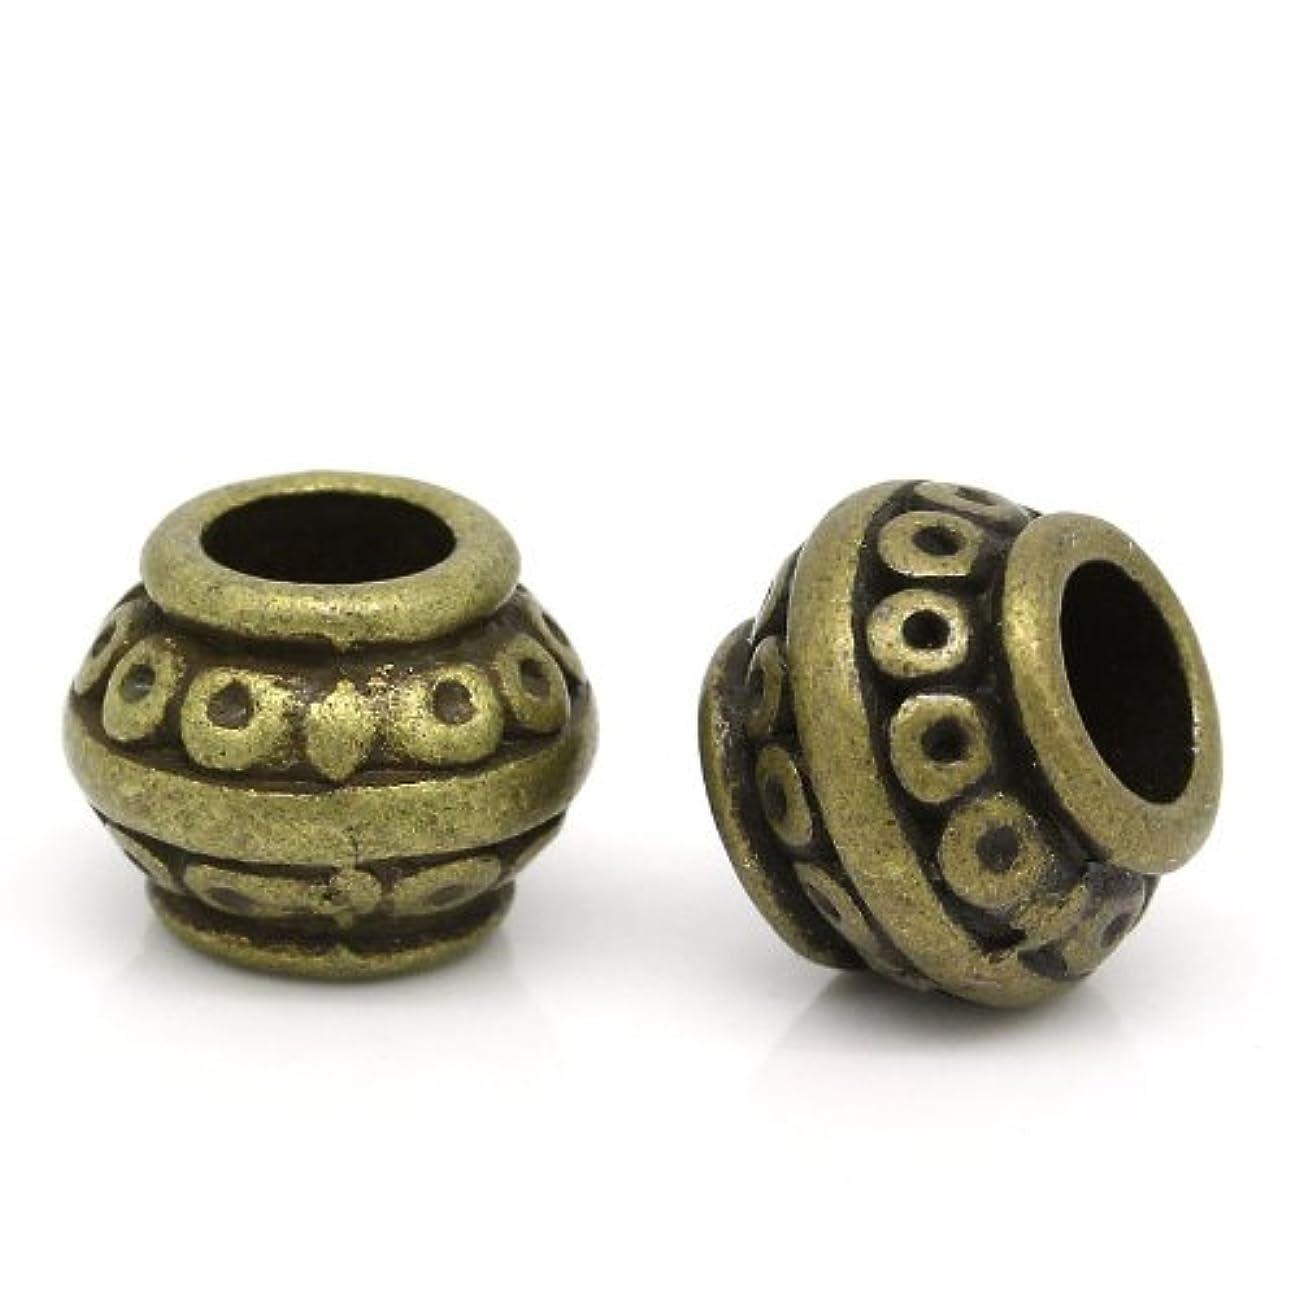 50pc Antiqued Bronze Dot Spacer Beads Large Hole Fit European Bracelet